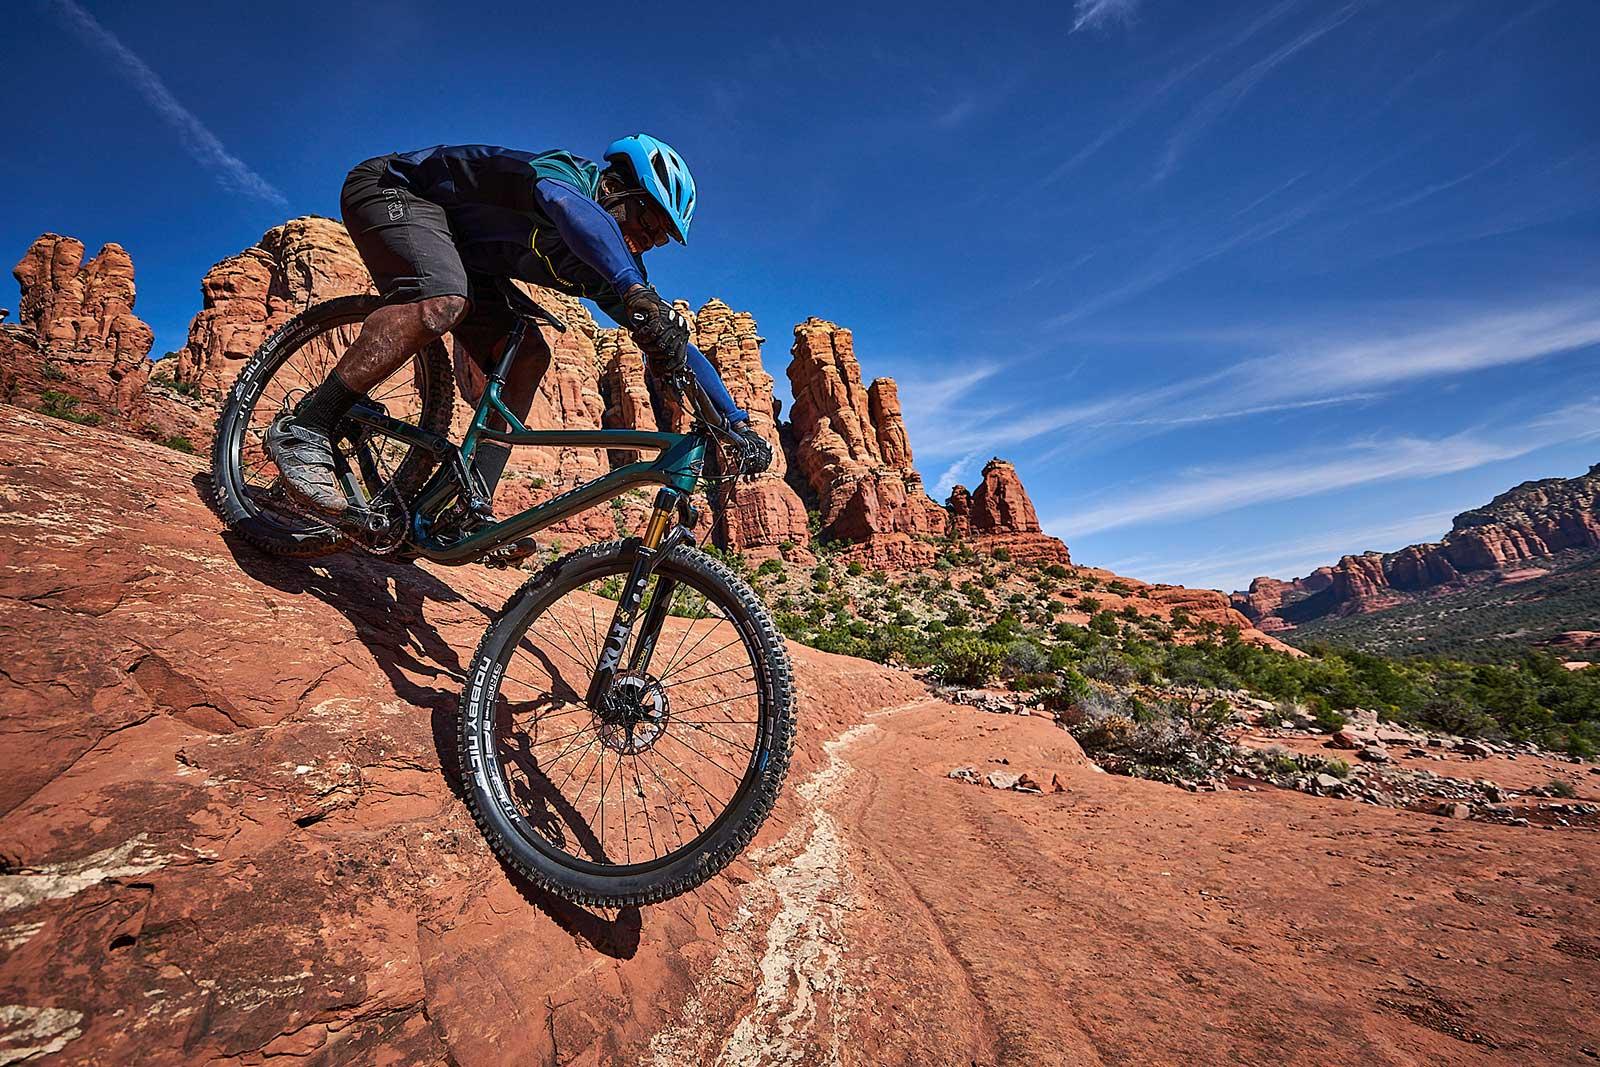 new niner jet 9 rdo trail mountain bike riding down rocks in sedona